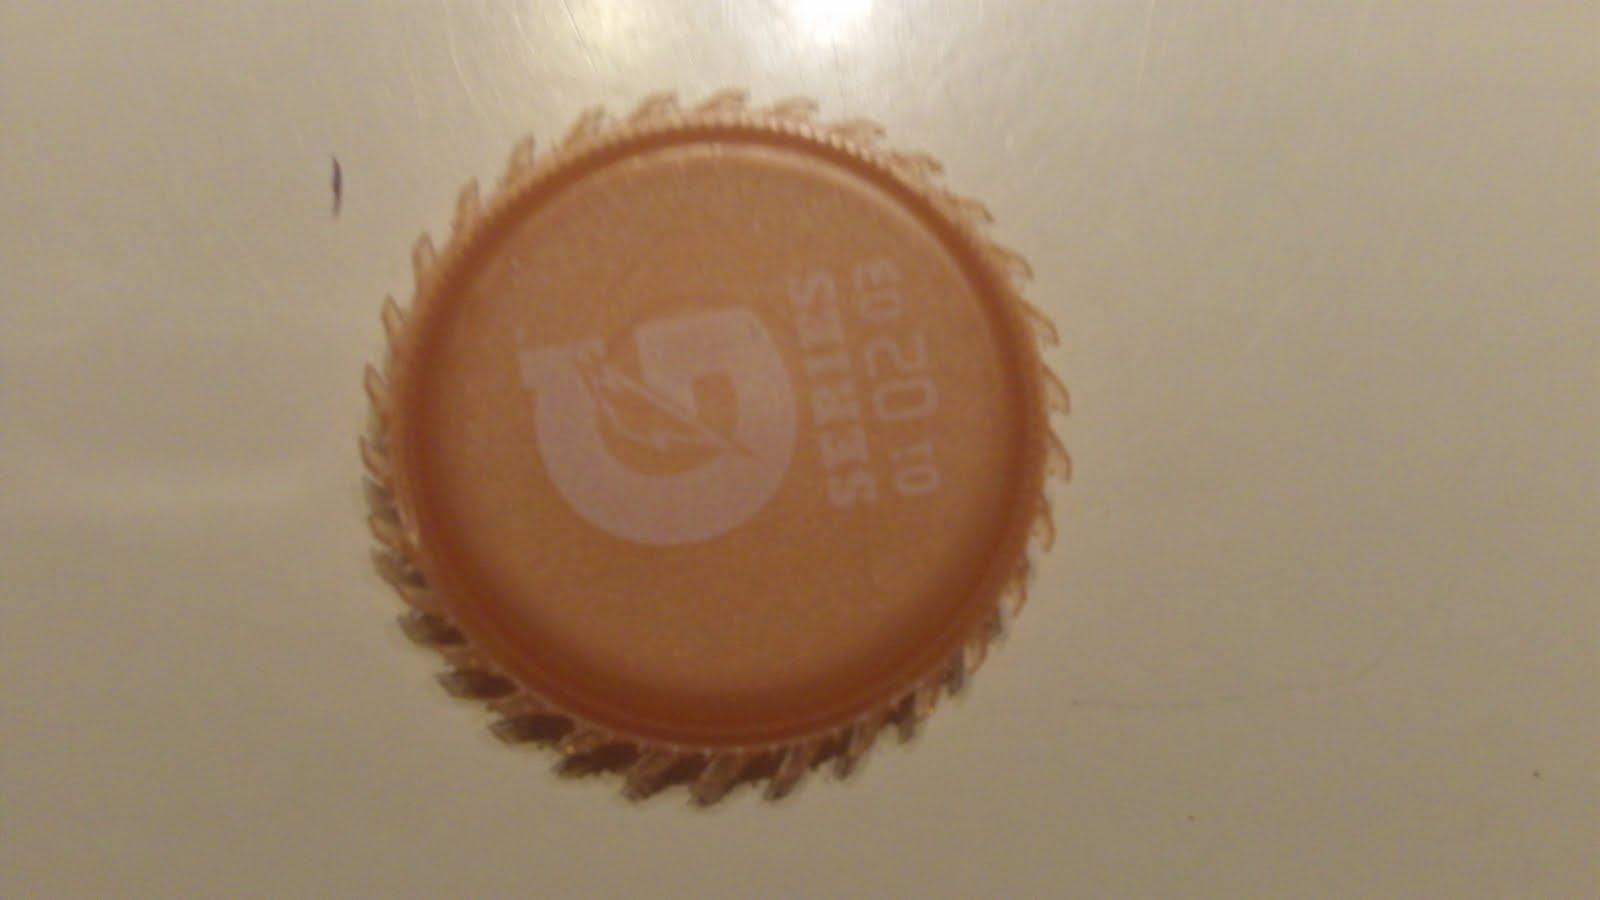 monkeyouwhos blog how to make a gatorade bottle cap dangerous